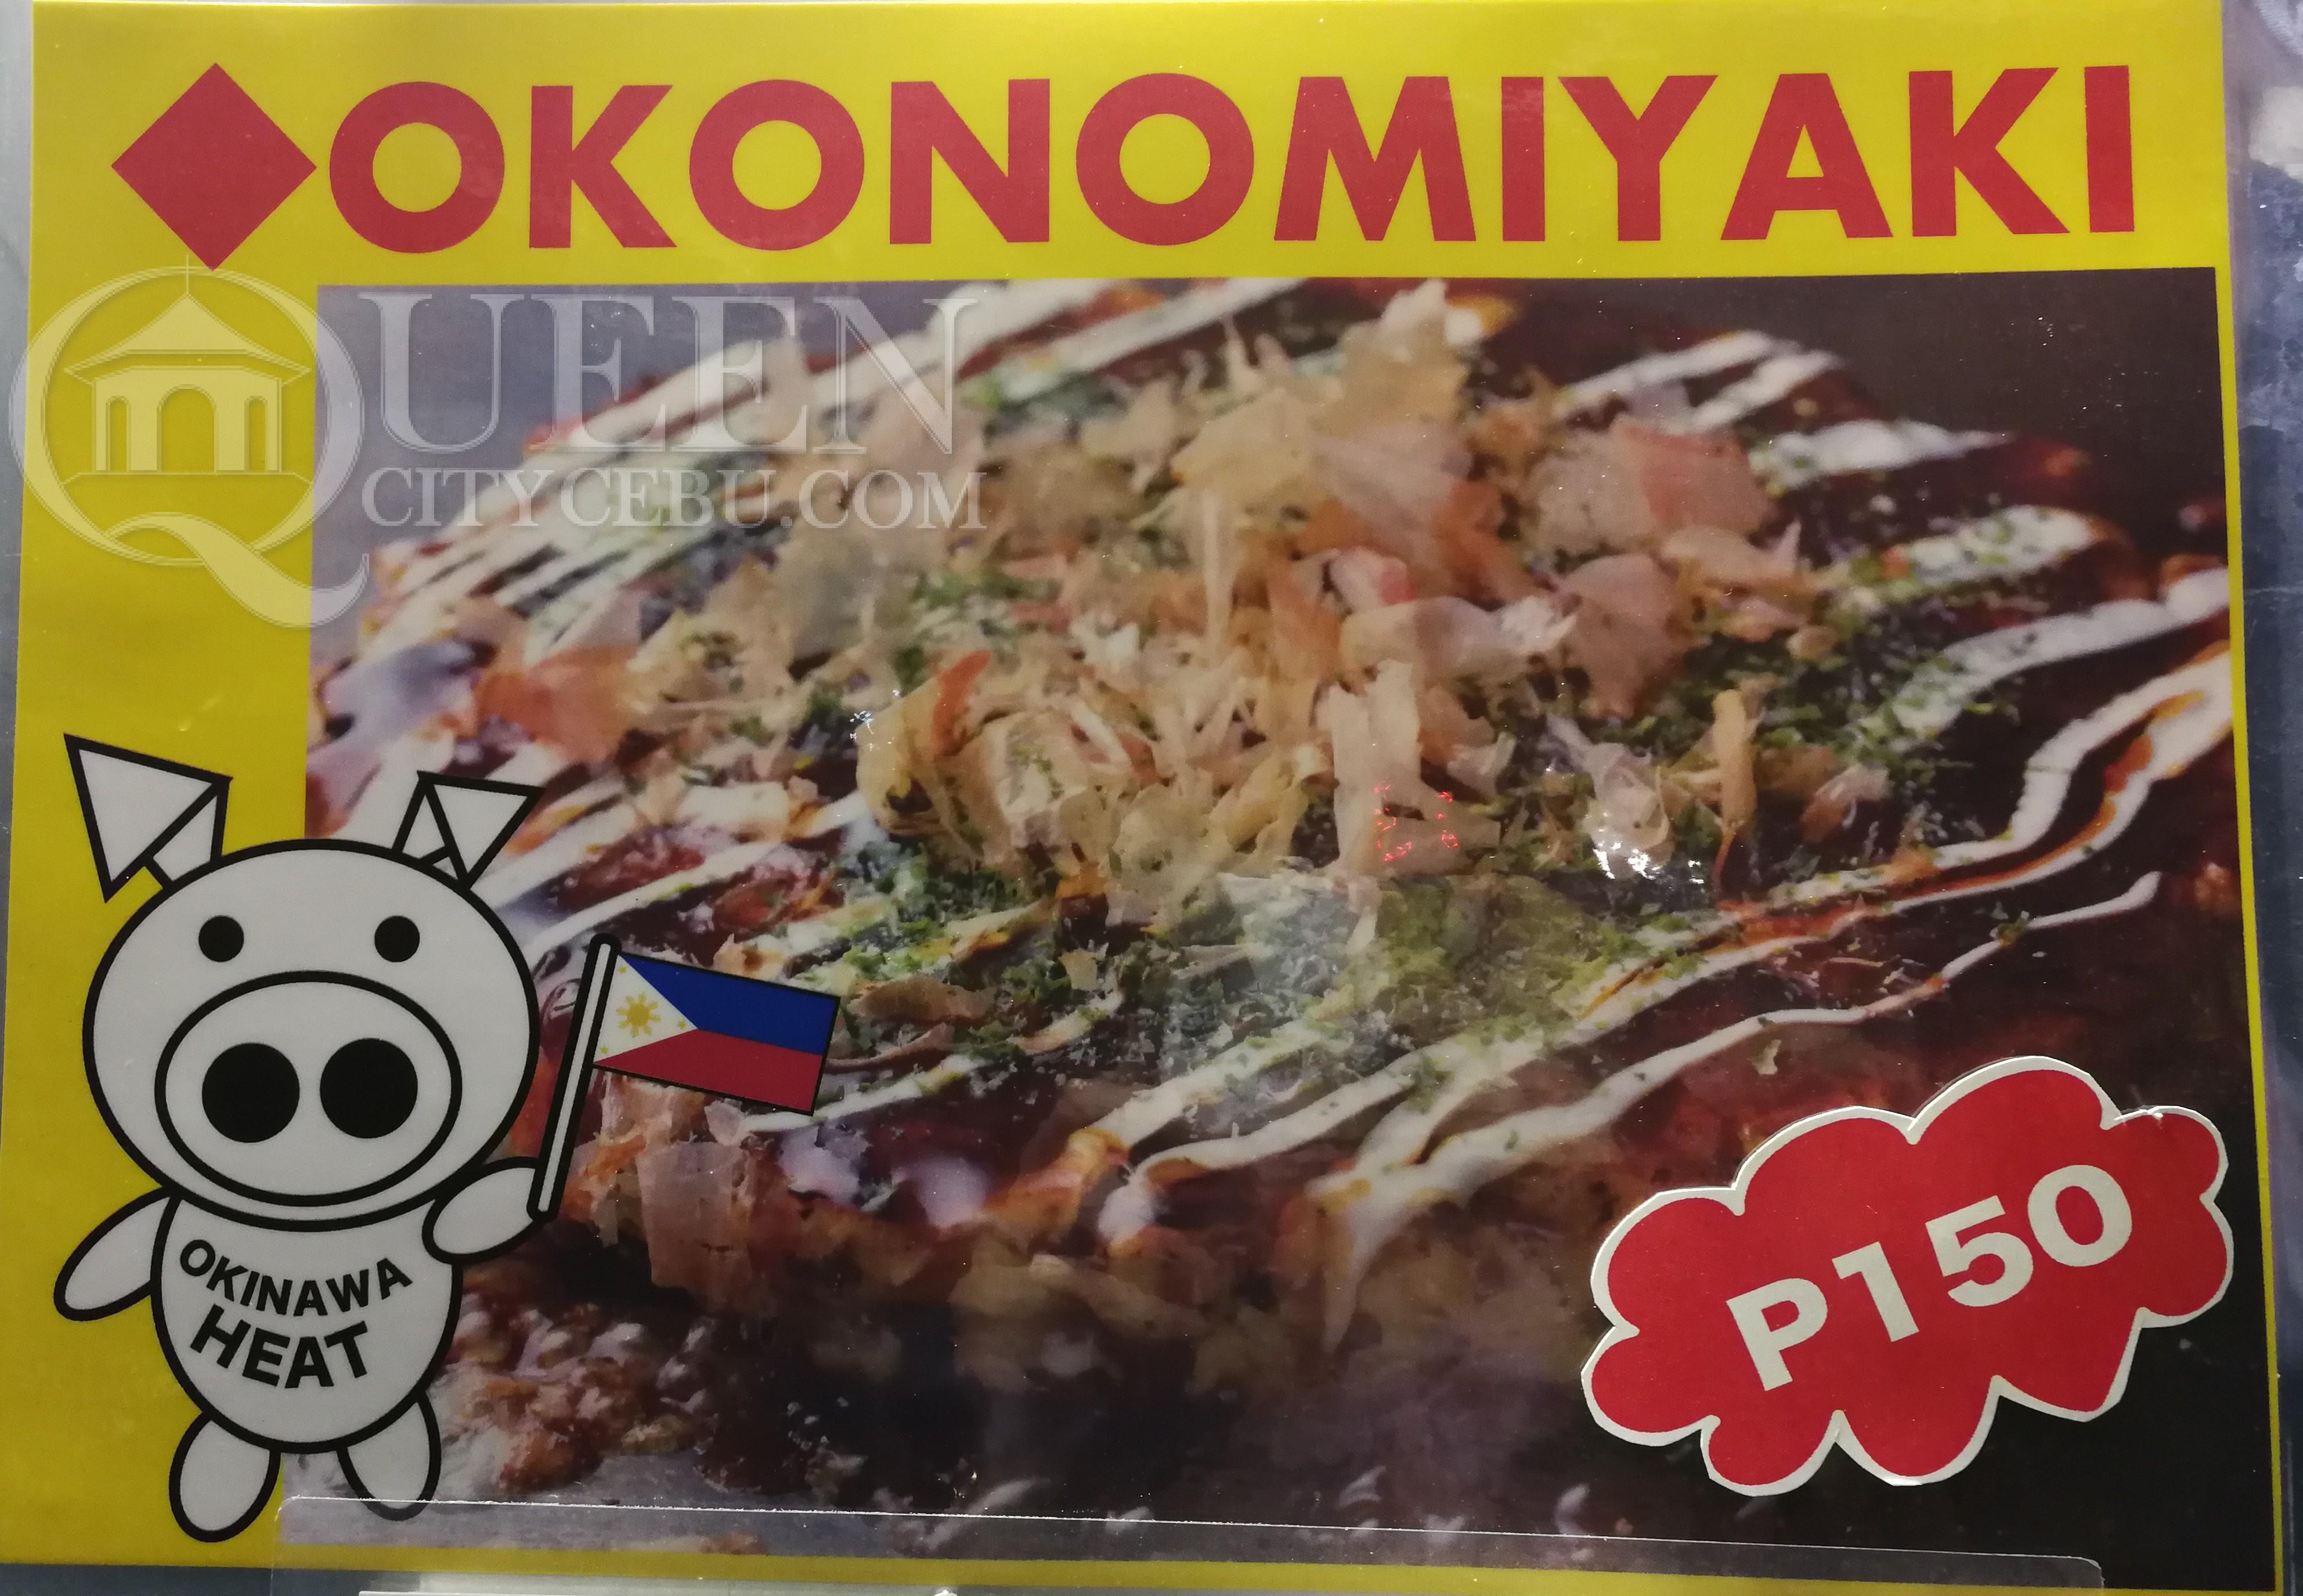 Japanese Pancake Okonomiyaki at Okinawa Heat Japanese Food Truck